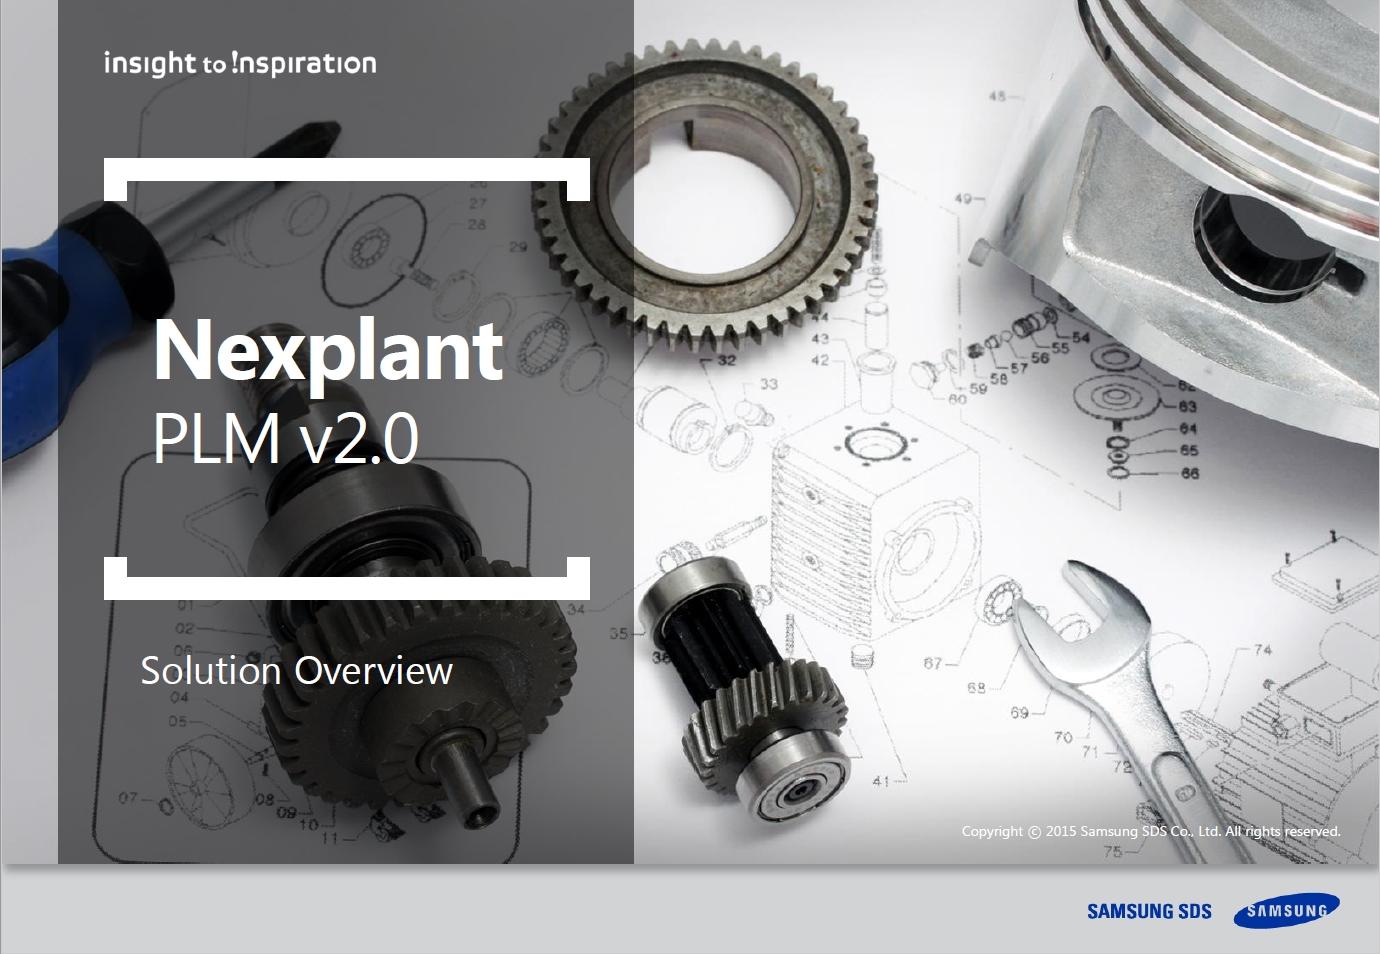 [Nexplant PLM] Integrate and streamline product development processes